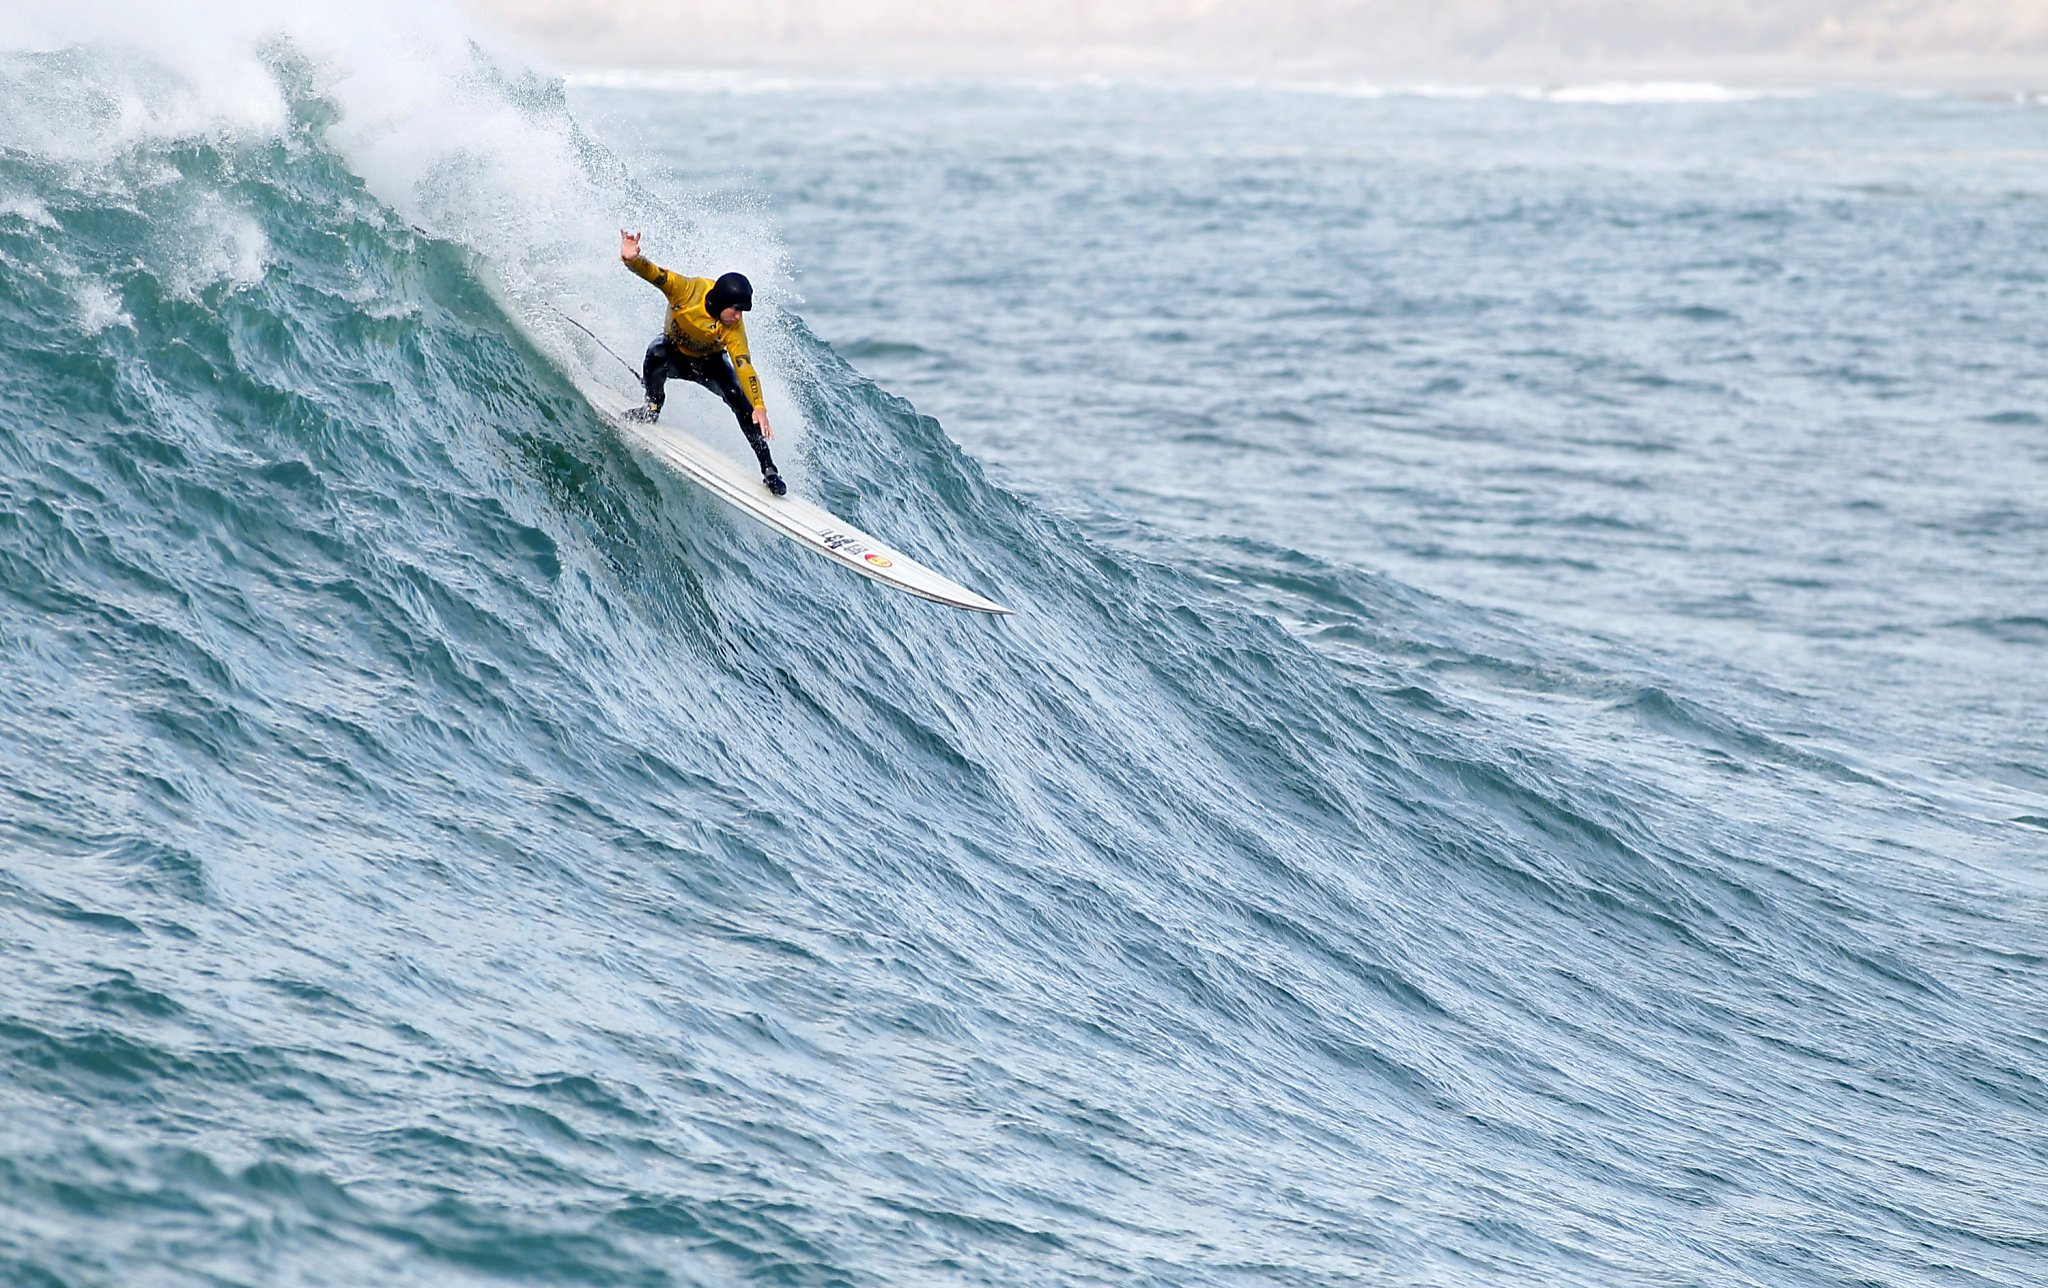 Mavericks surf contest draws thousands to experience thrills